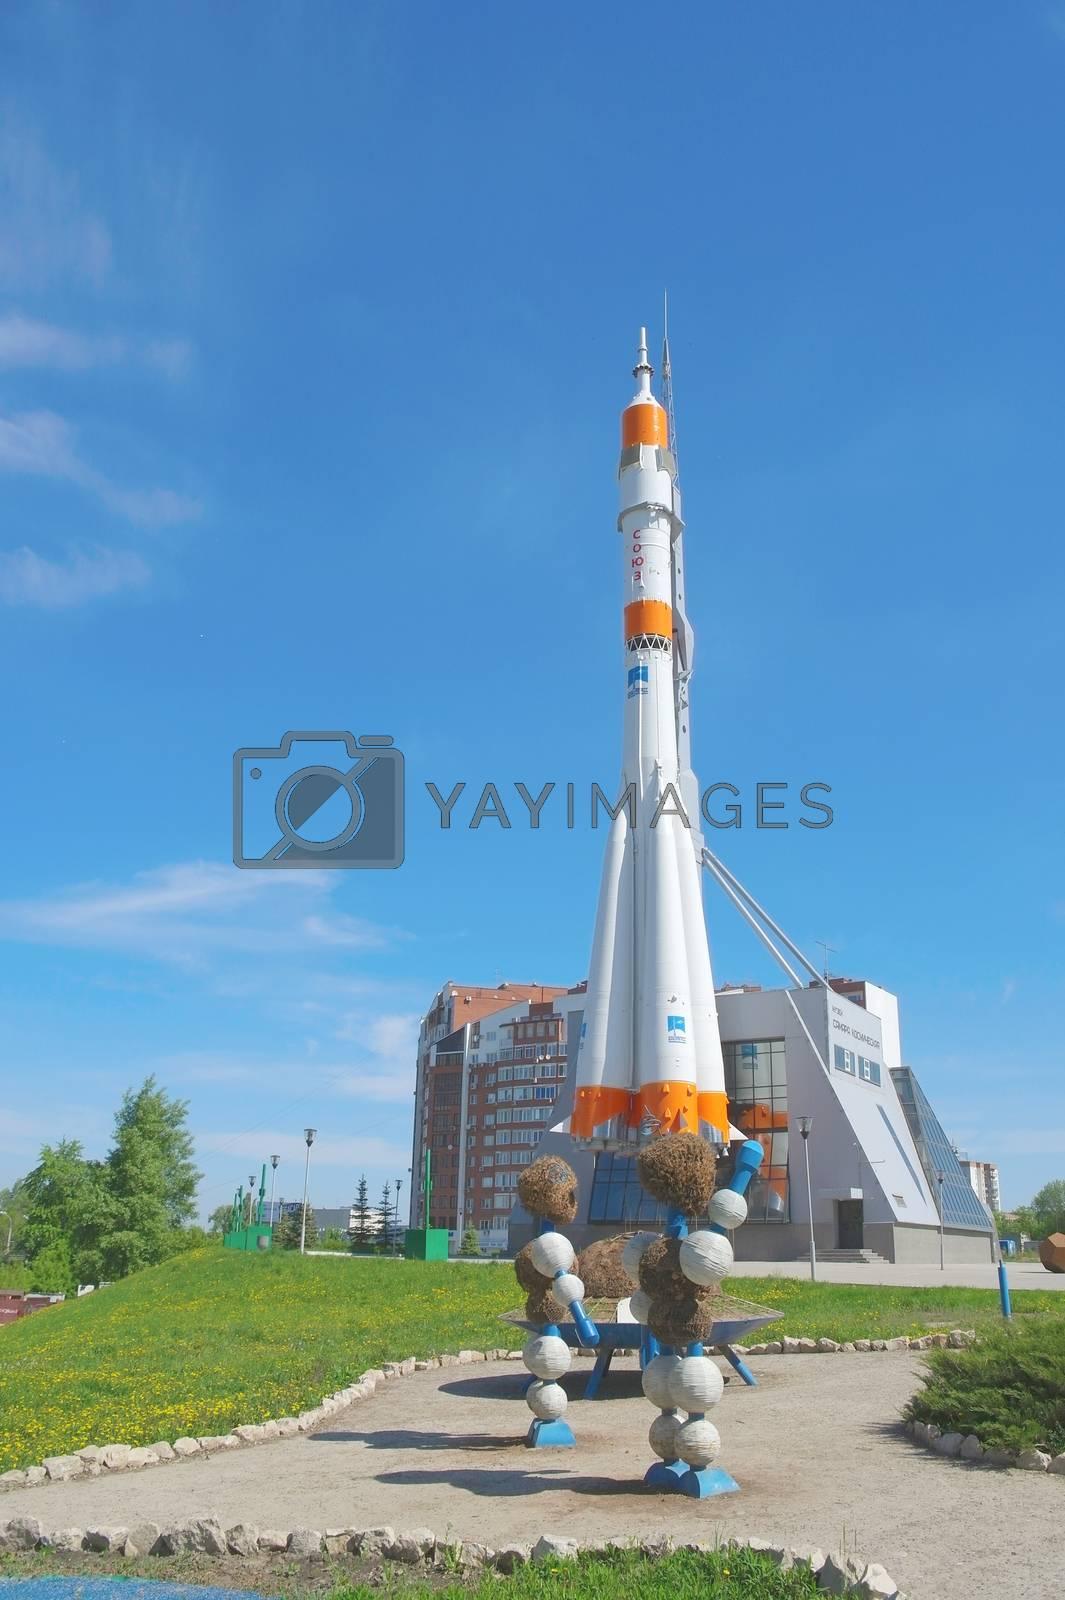 Soyuz rocket as monument by sergpet